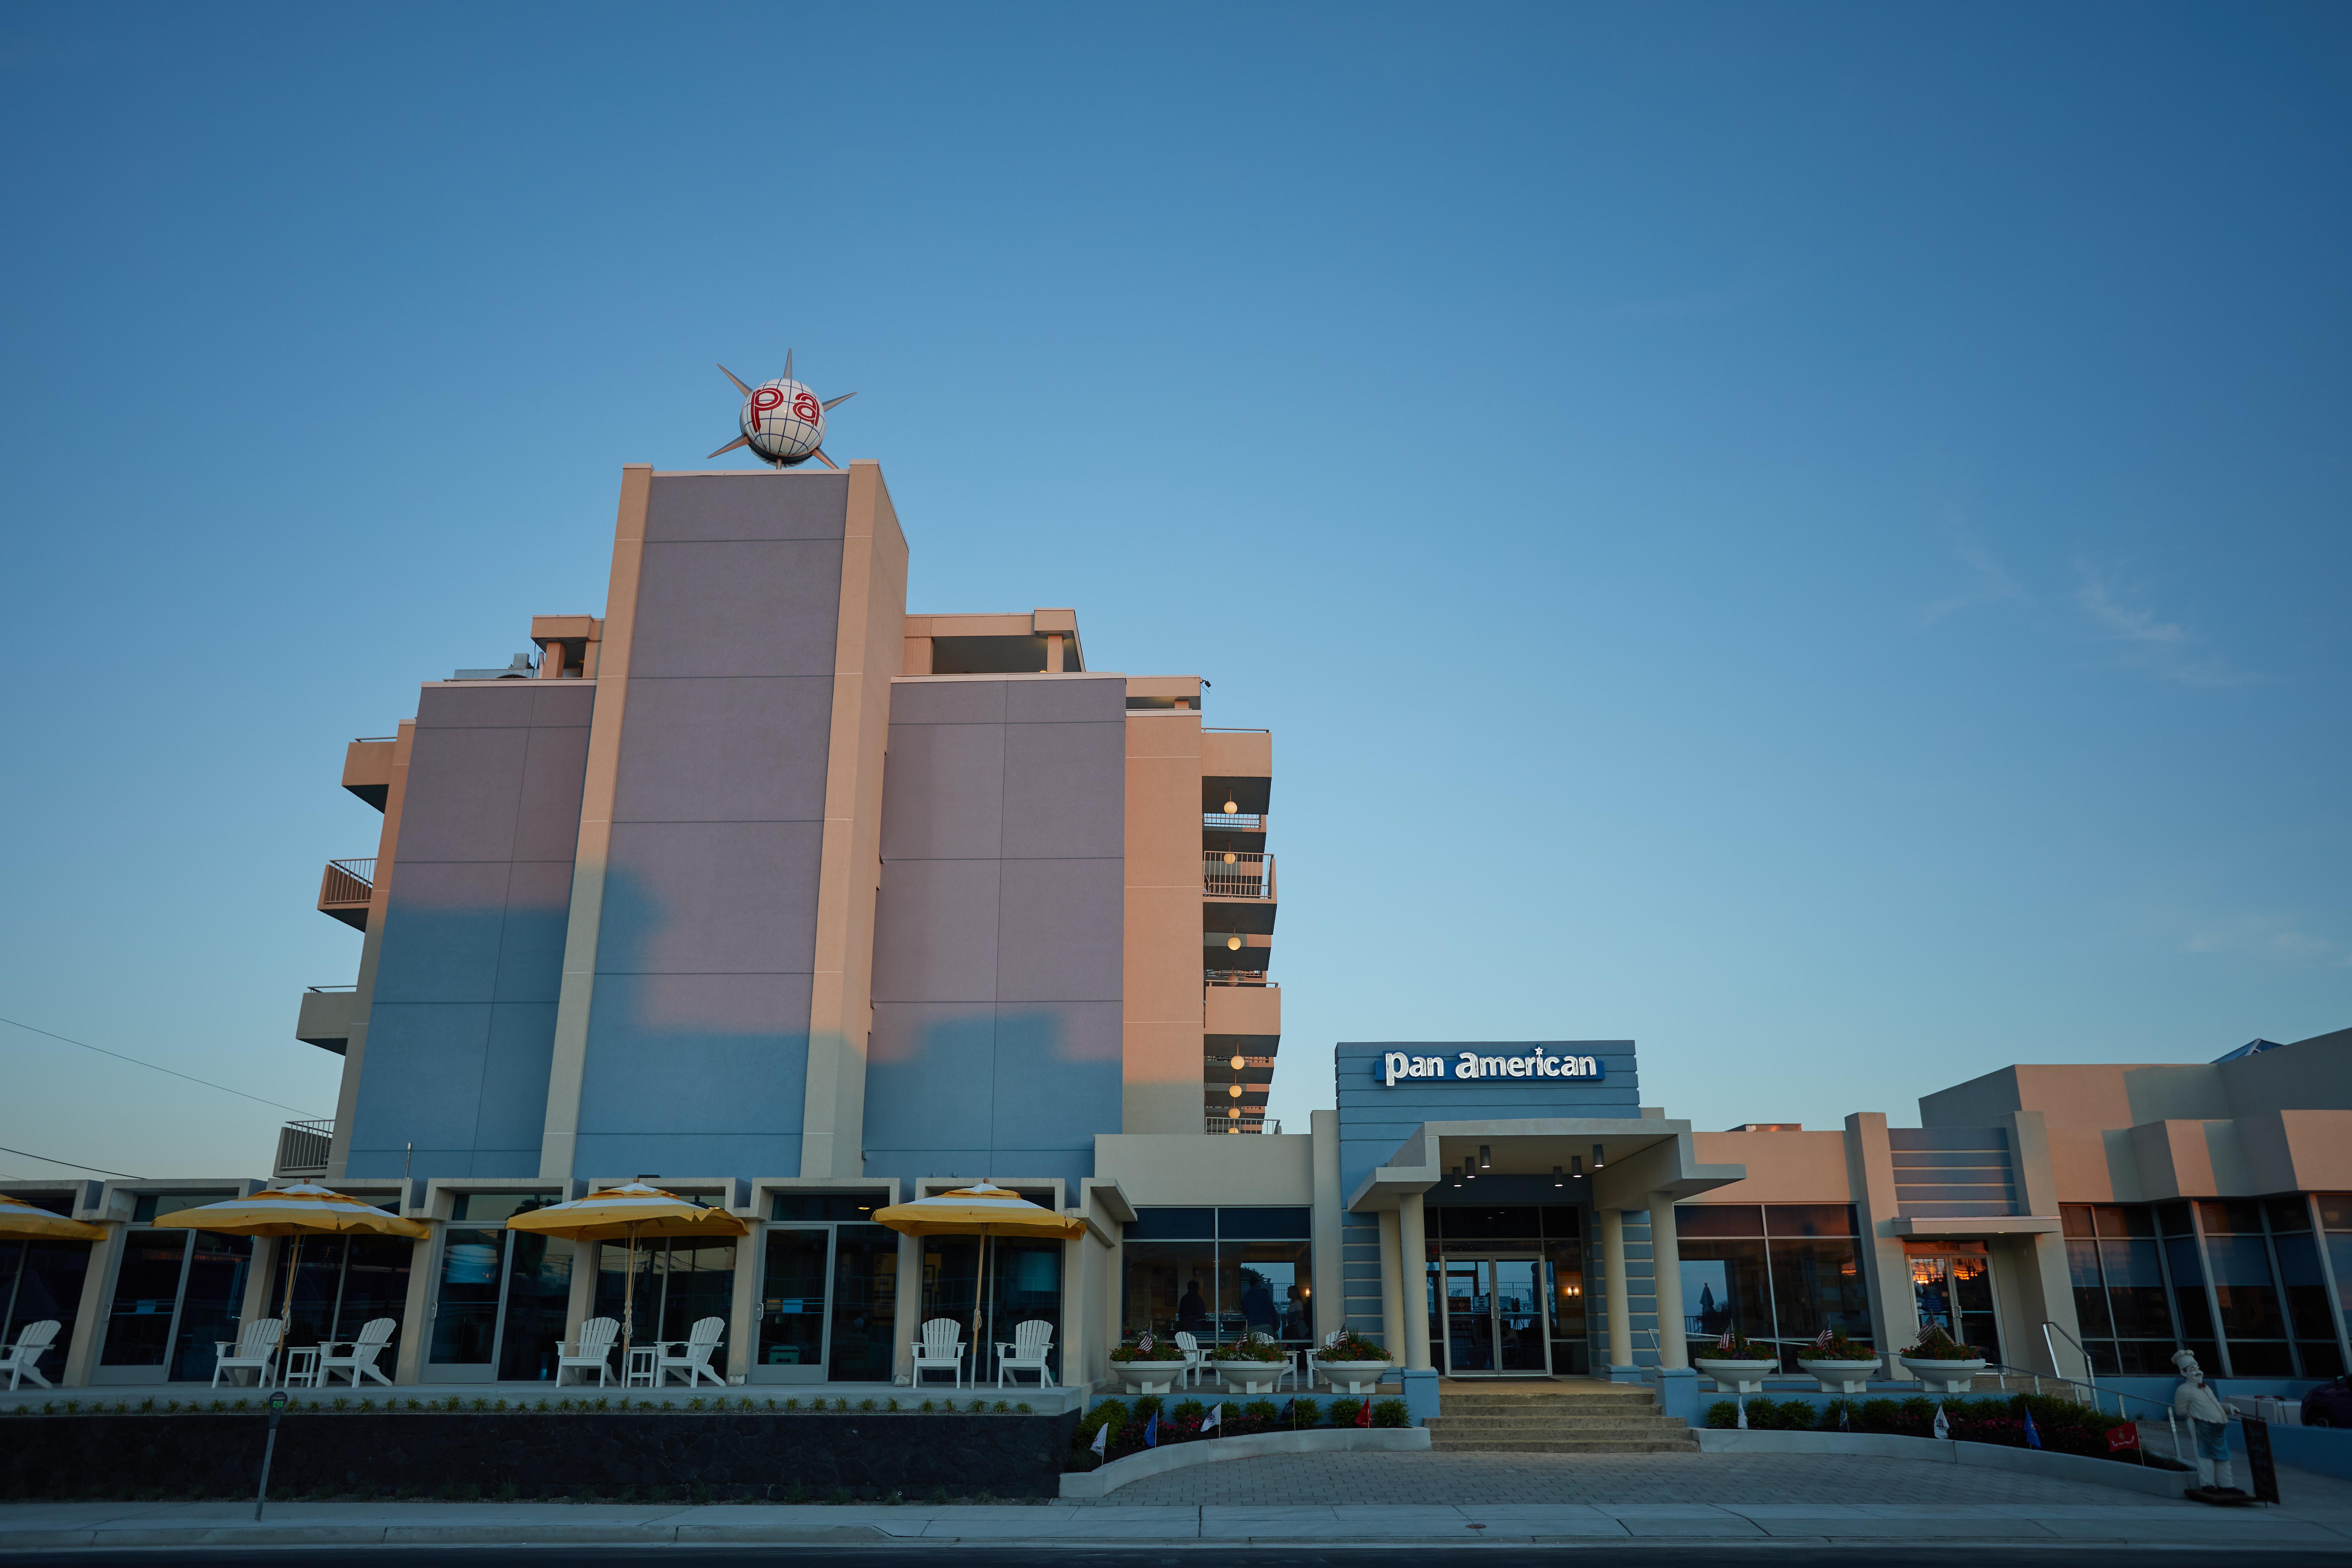 Exterior of Pan American hotel.